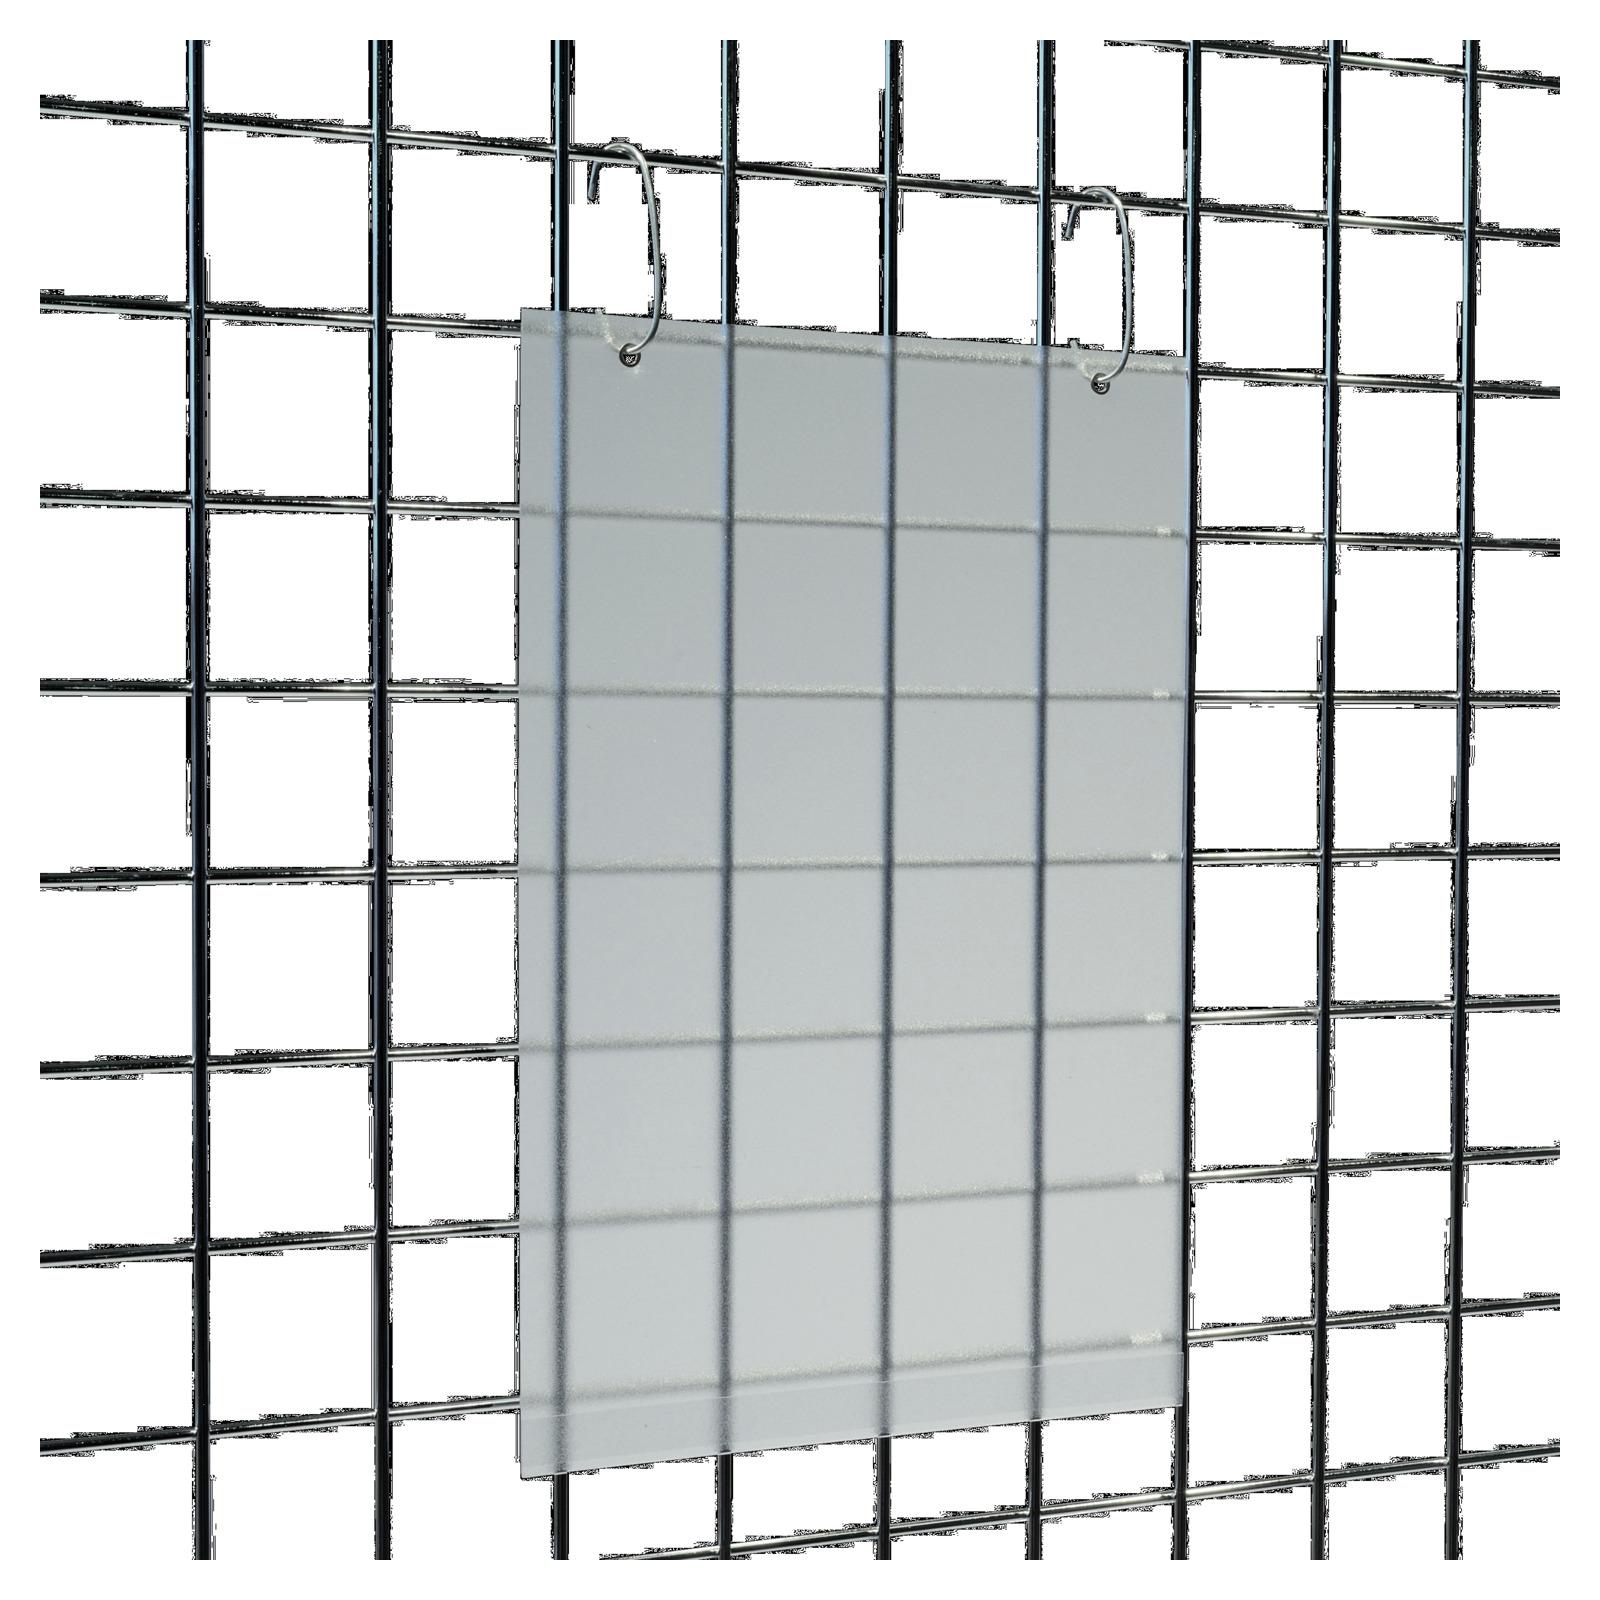 h nge plakattasche mit c haken din a4 gitterst nder verkaufsst nder. Black Bedroom Furniture Sets. Home Design Ideas